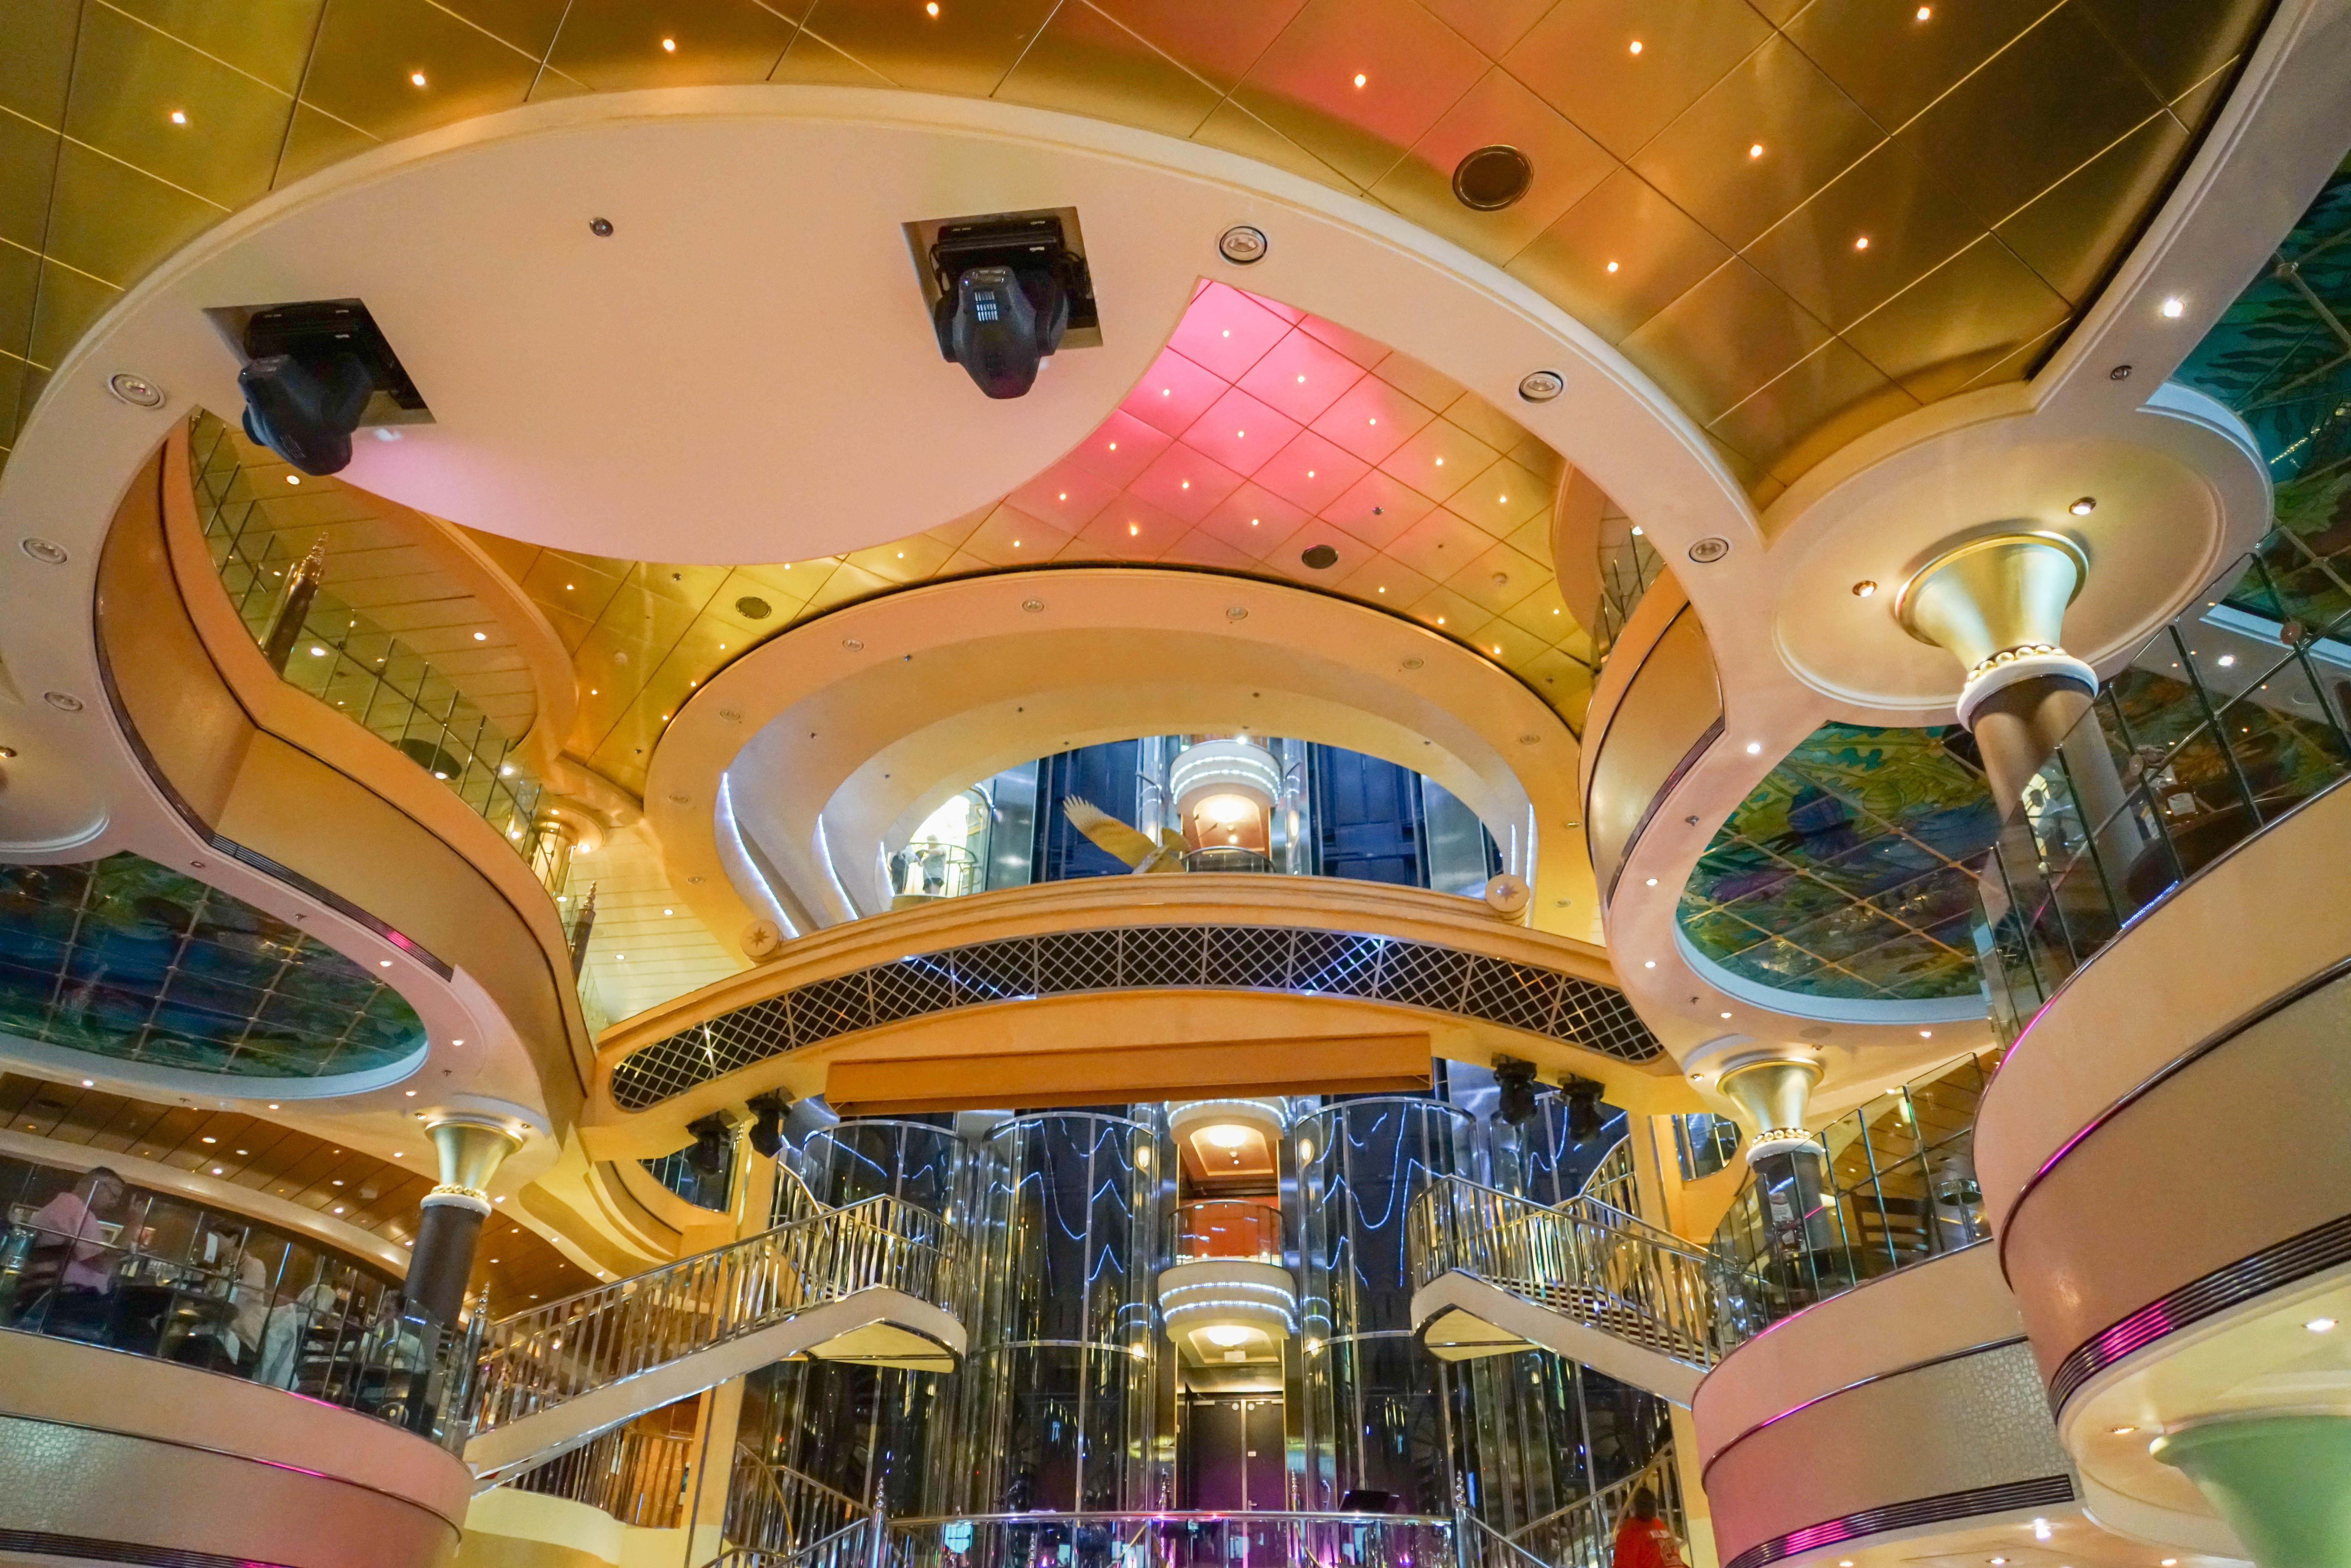 Free images interior travel transportation ceiling for Amusement park decoration ideas